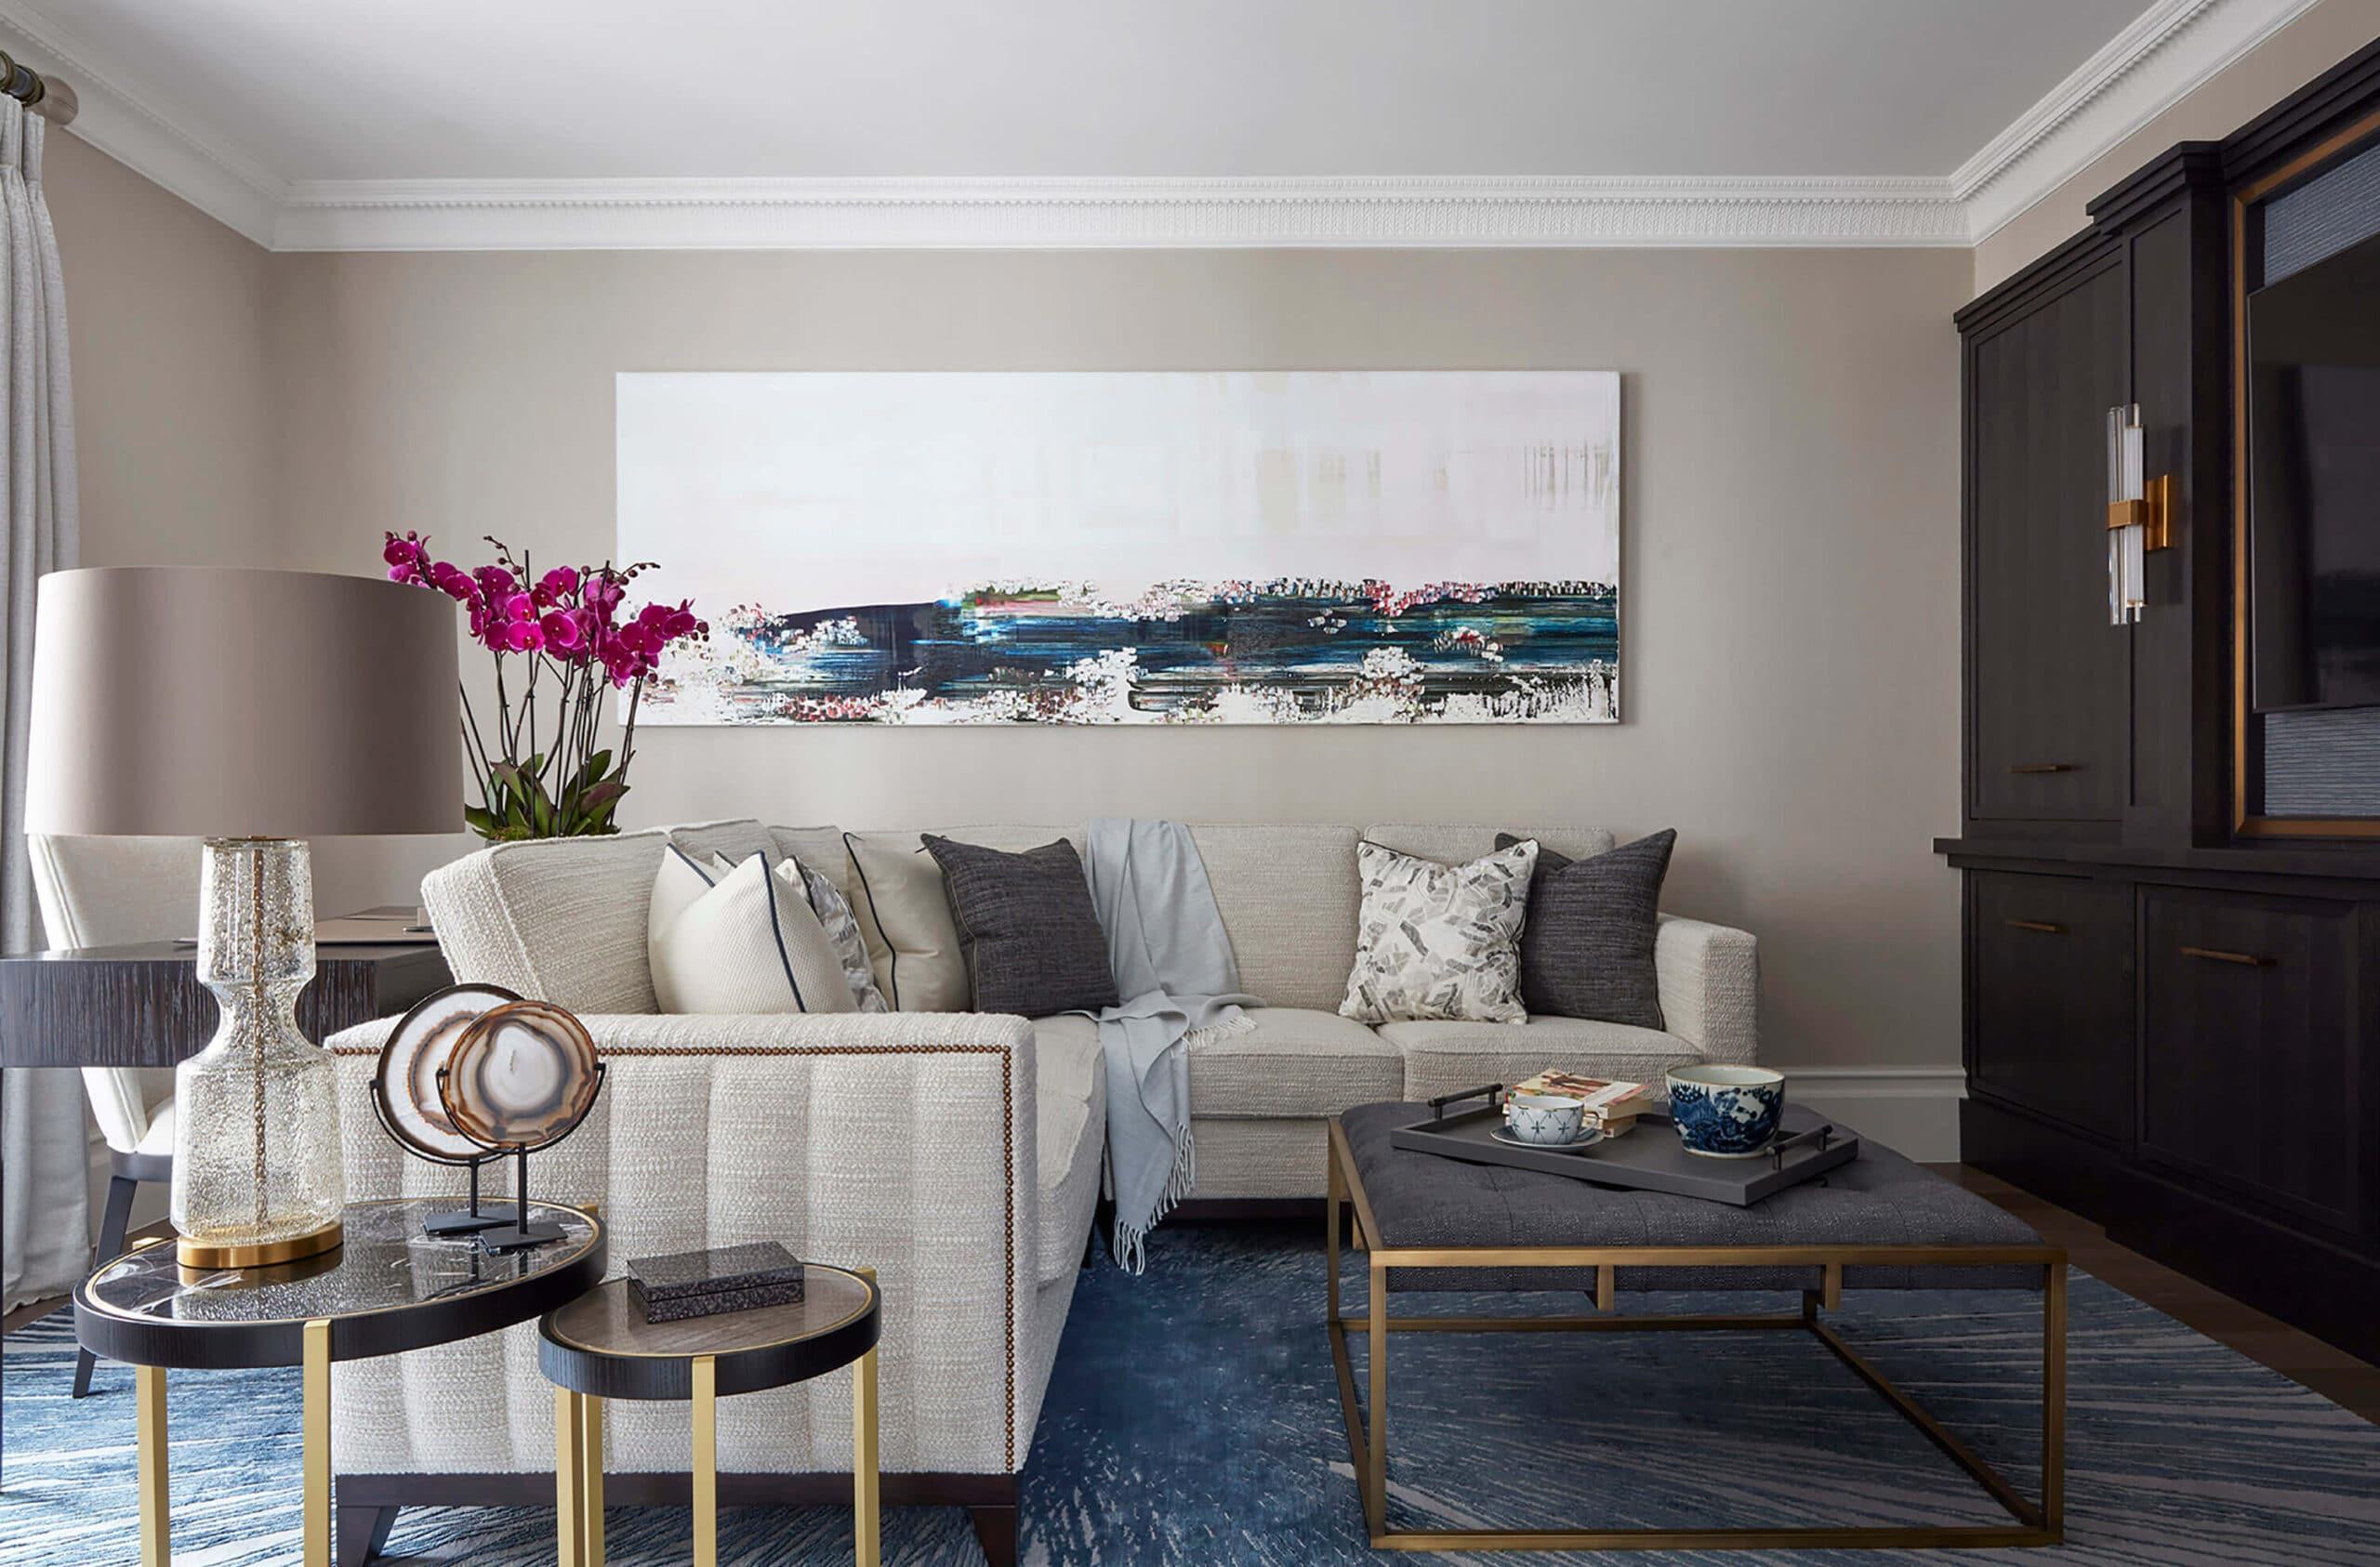 luxury interior design townhouse project in kensington